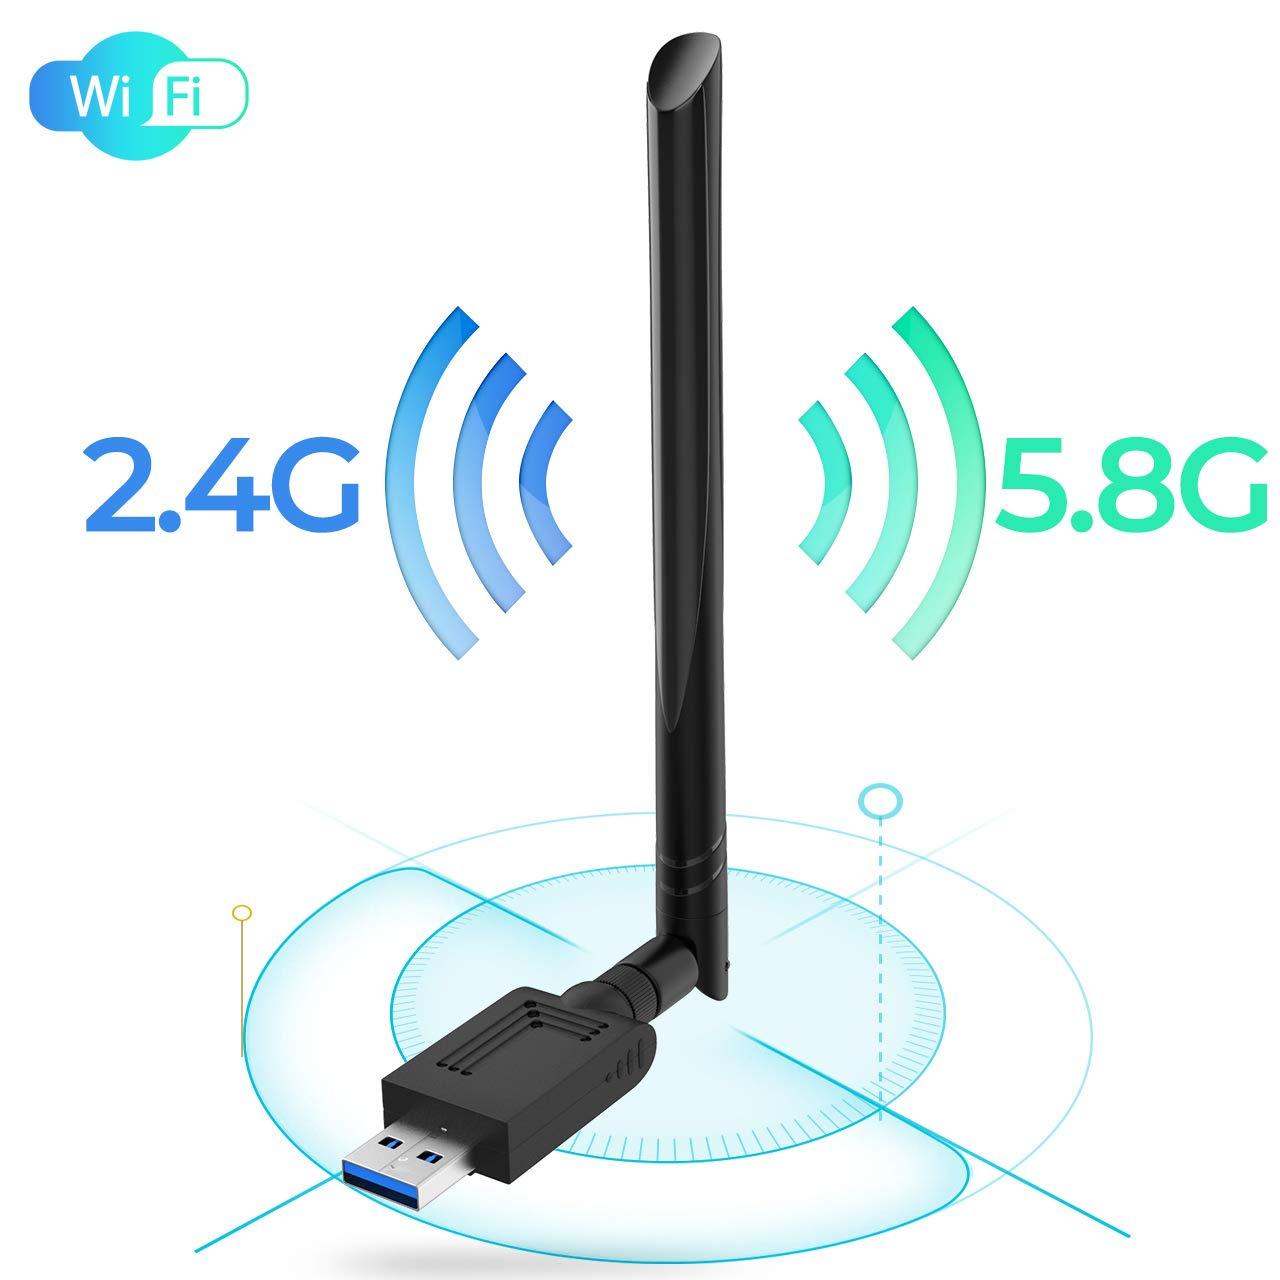 USB WiFi Adapter, 1200Mbps Mini 802.11ac Dual Band 2.4GHz/5.8GHz Wireless Network Adapter with USB 3.0 Wireless Network Antenna for PC/Desktop/Laptop Support Windows 10/8/8.1/7/Vista/XP/Mac 10.5-10.13 by MIZOO